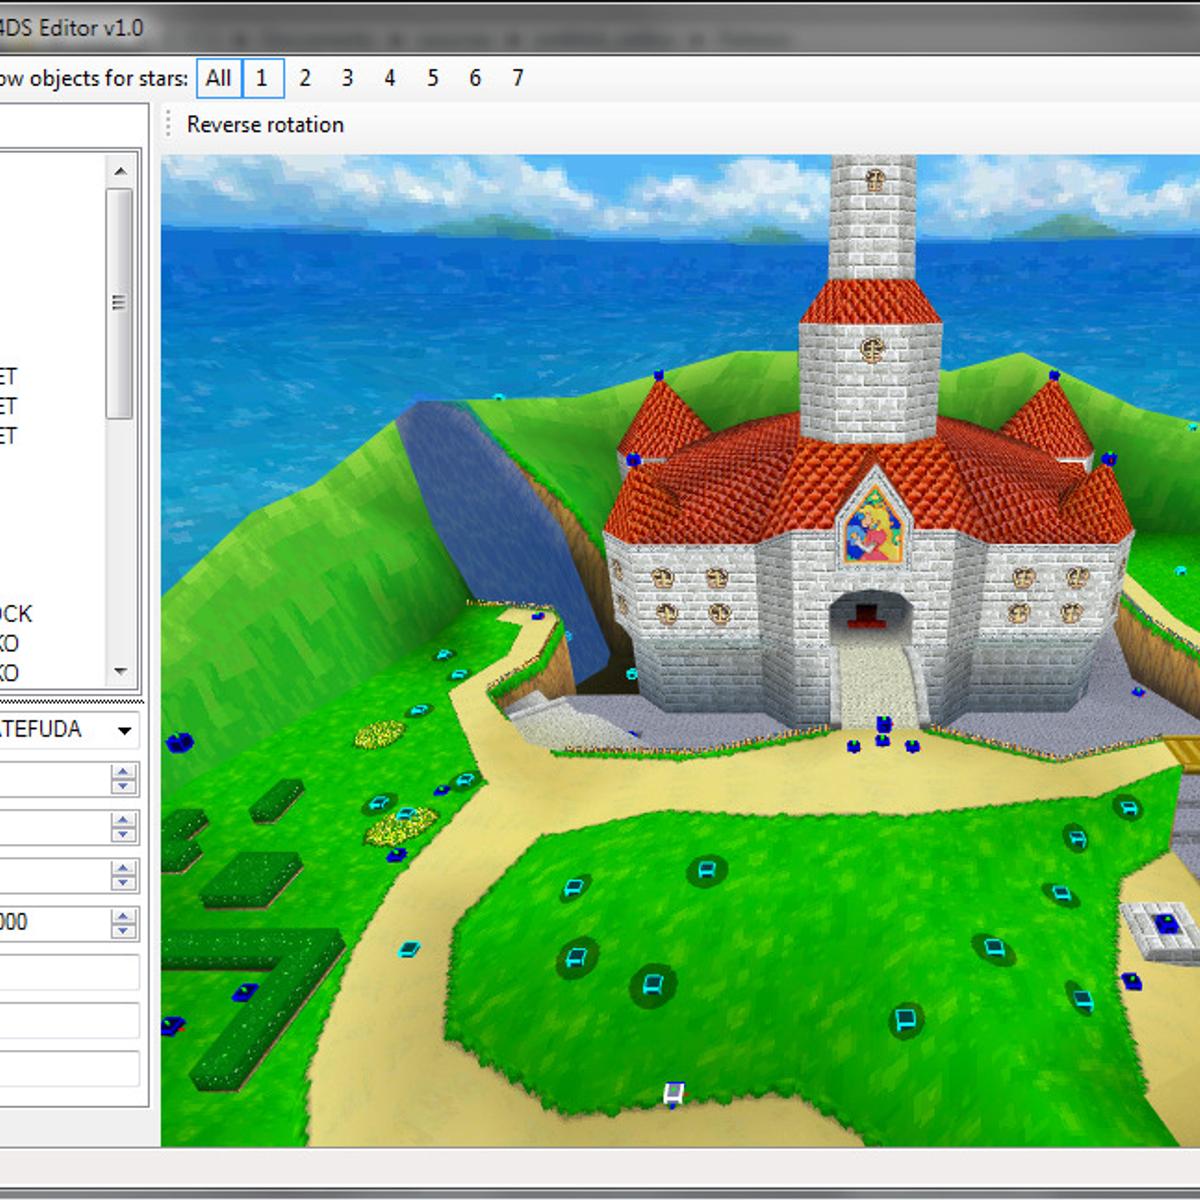 Super Mario 64 Ds Editor Alternatives And Similar Games